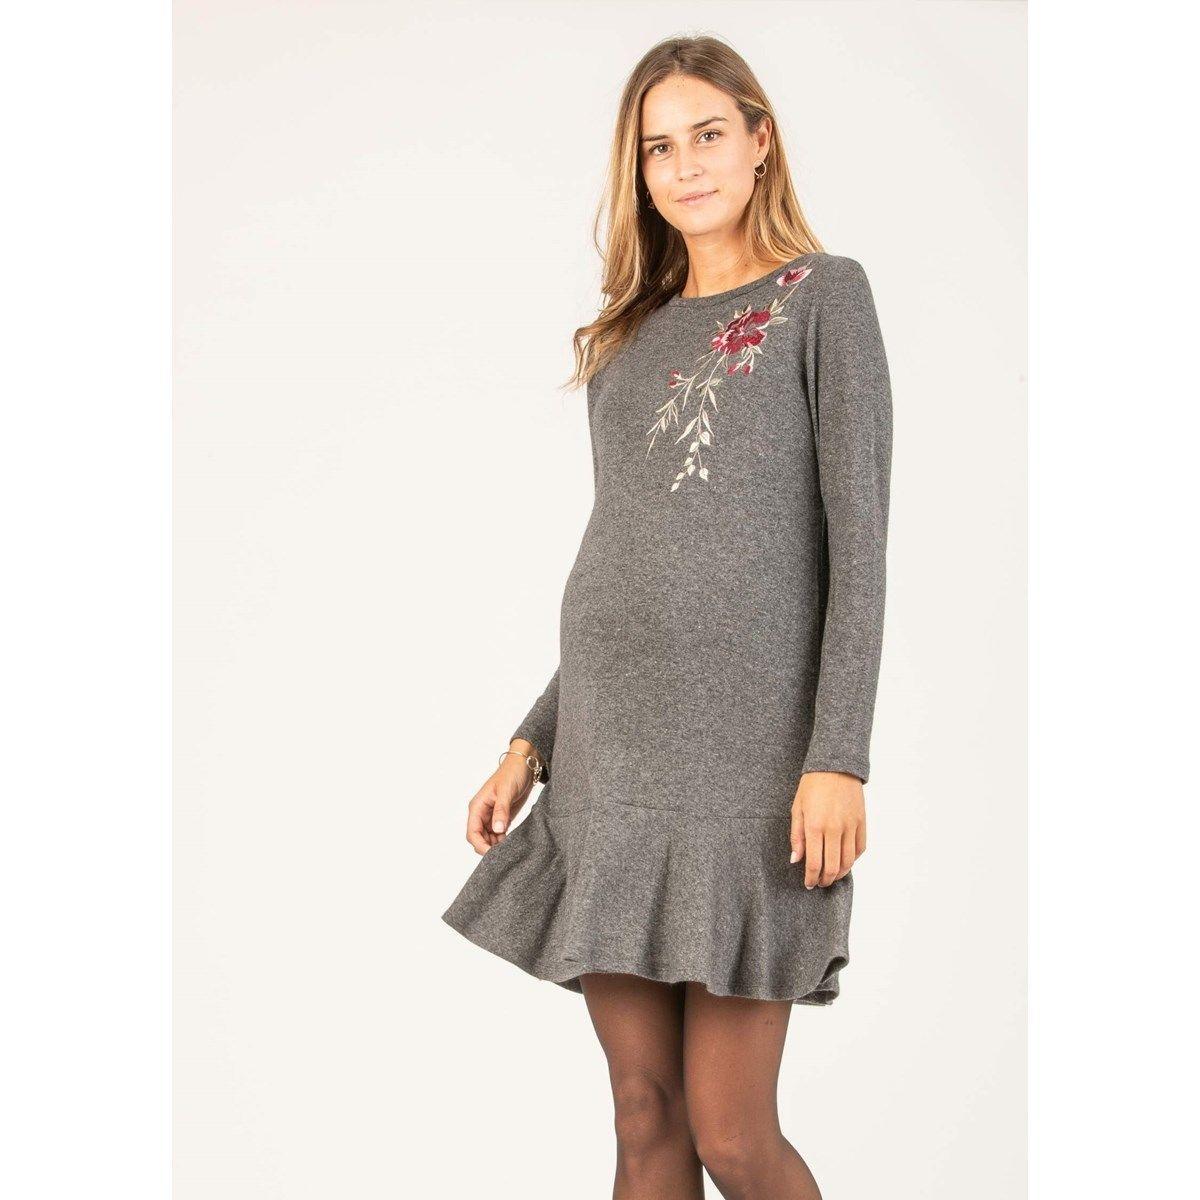 Robe de grossesse en laine avec broderie floral